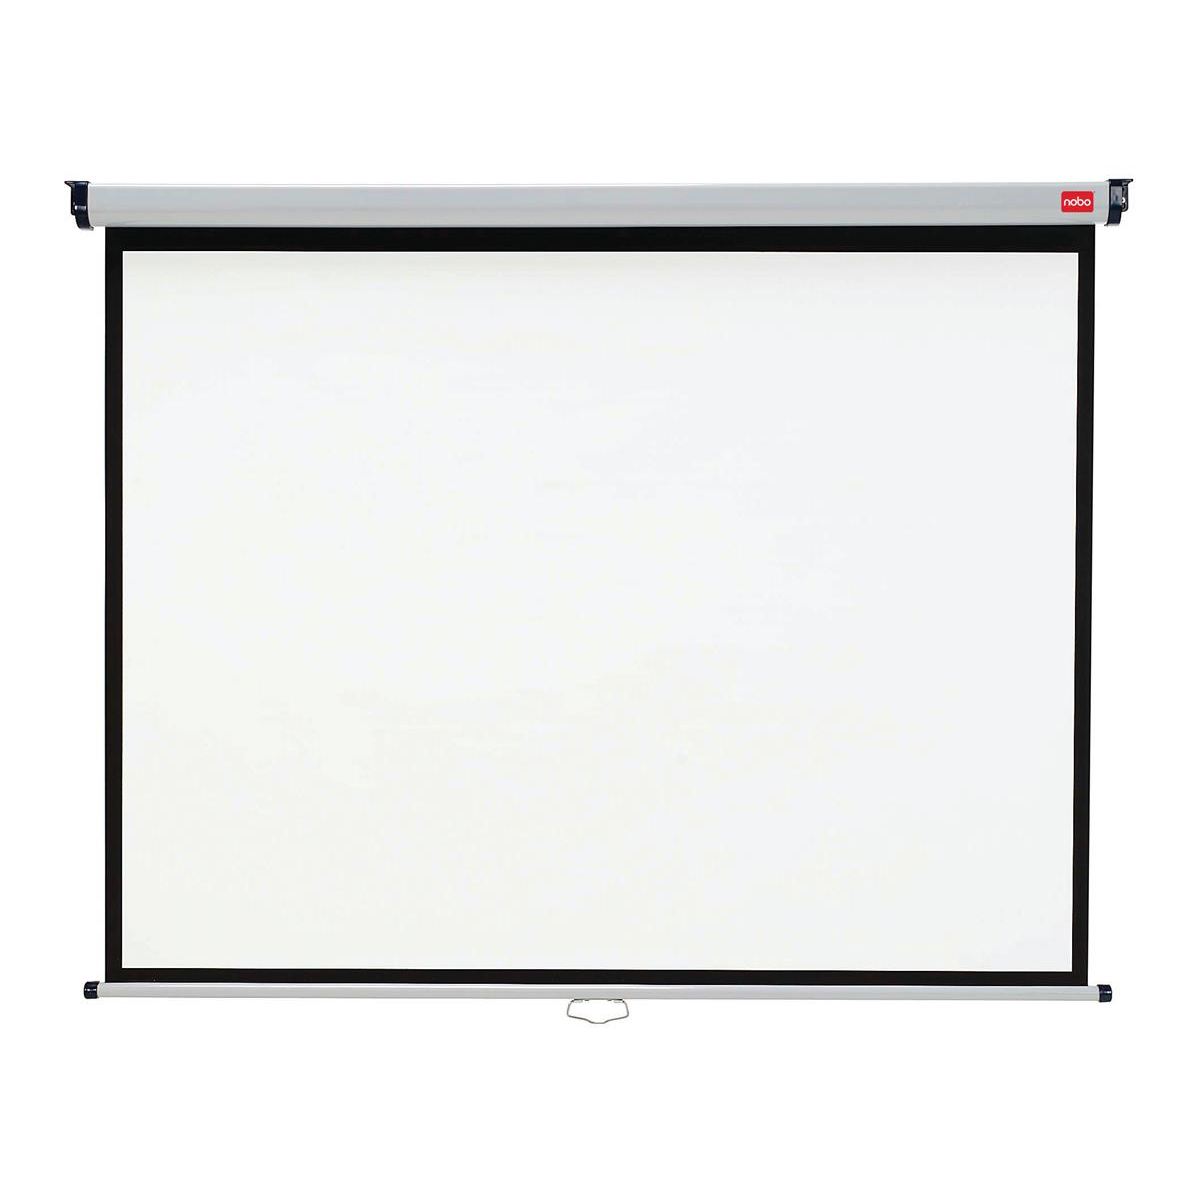 Nobo Wall Screen Wide Angle 2000x1350mm Ref 1902393W-